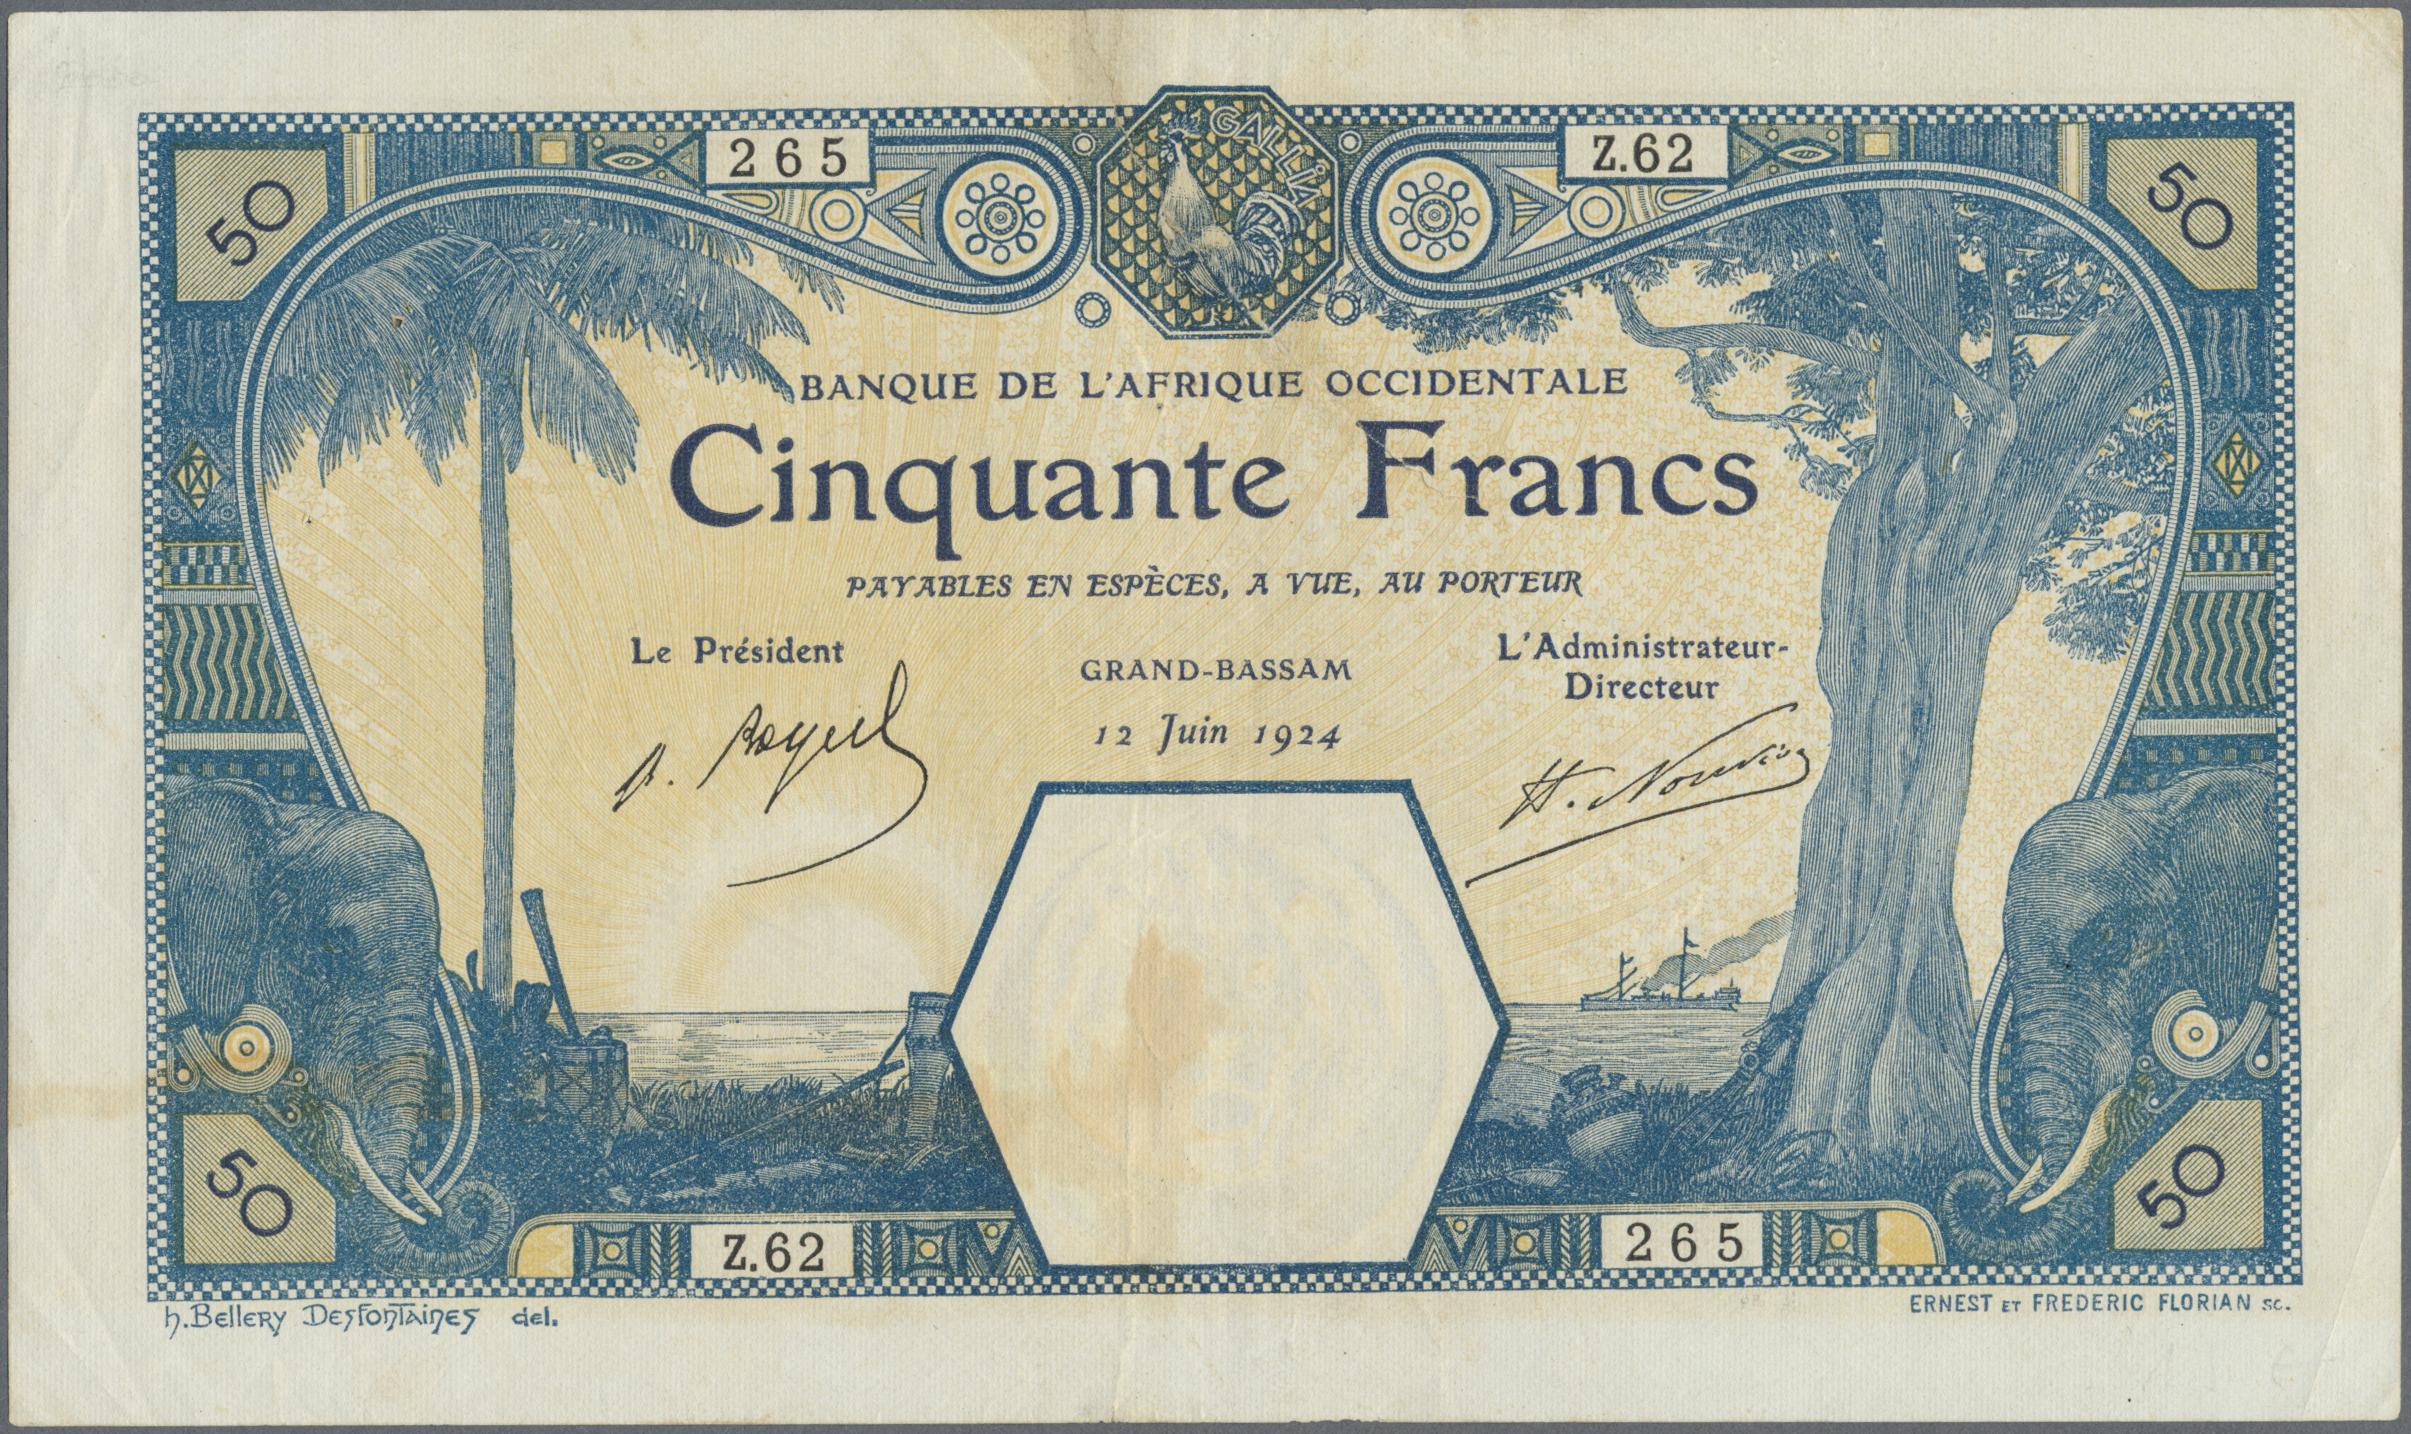 Lot 00351 - French West Africa / Französisch Westafrika | Banknoten  -  Auktionshaus Christoph Gärtner GmbH & Co. KG Sale #48 The Banknotes